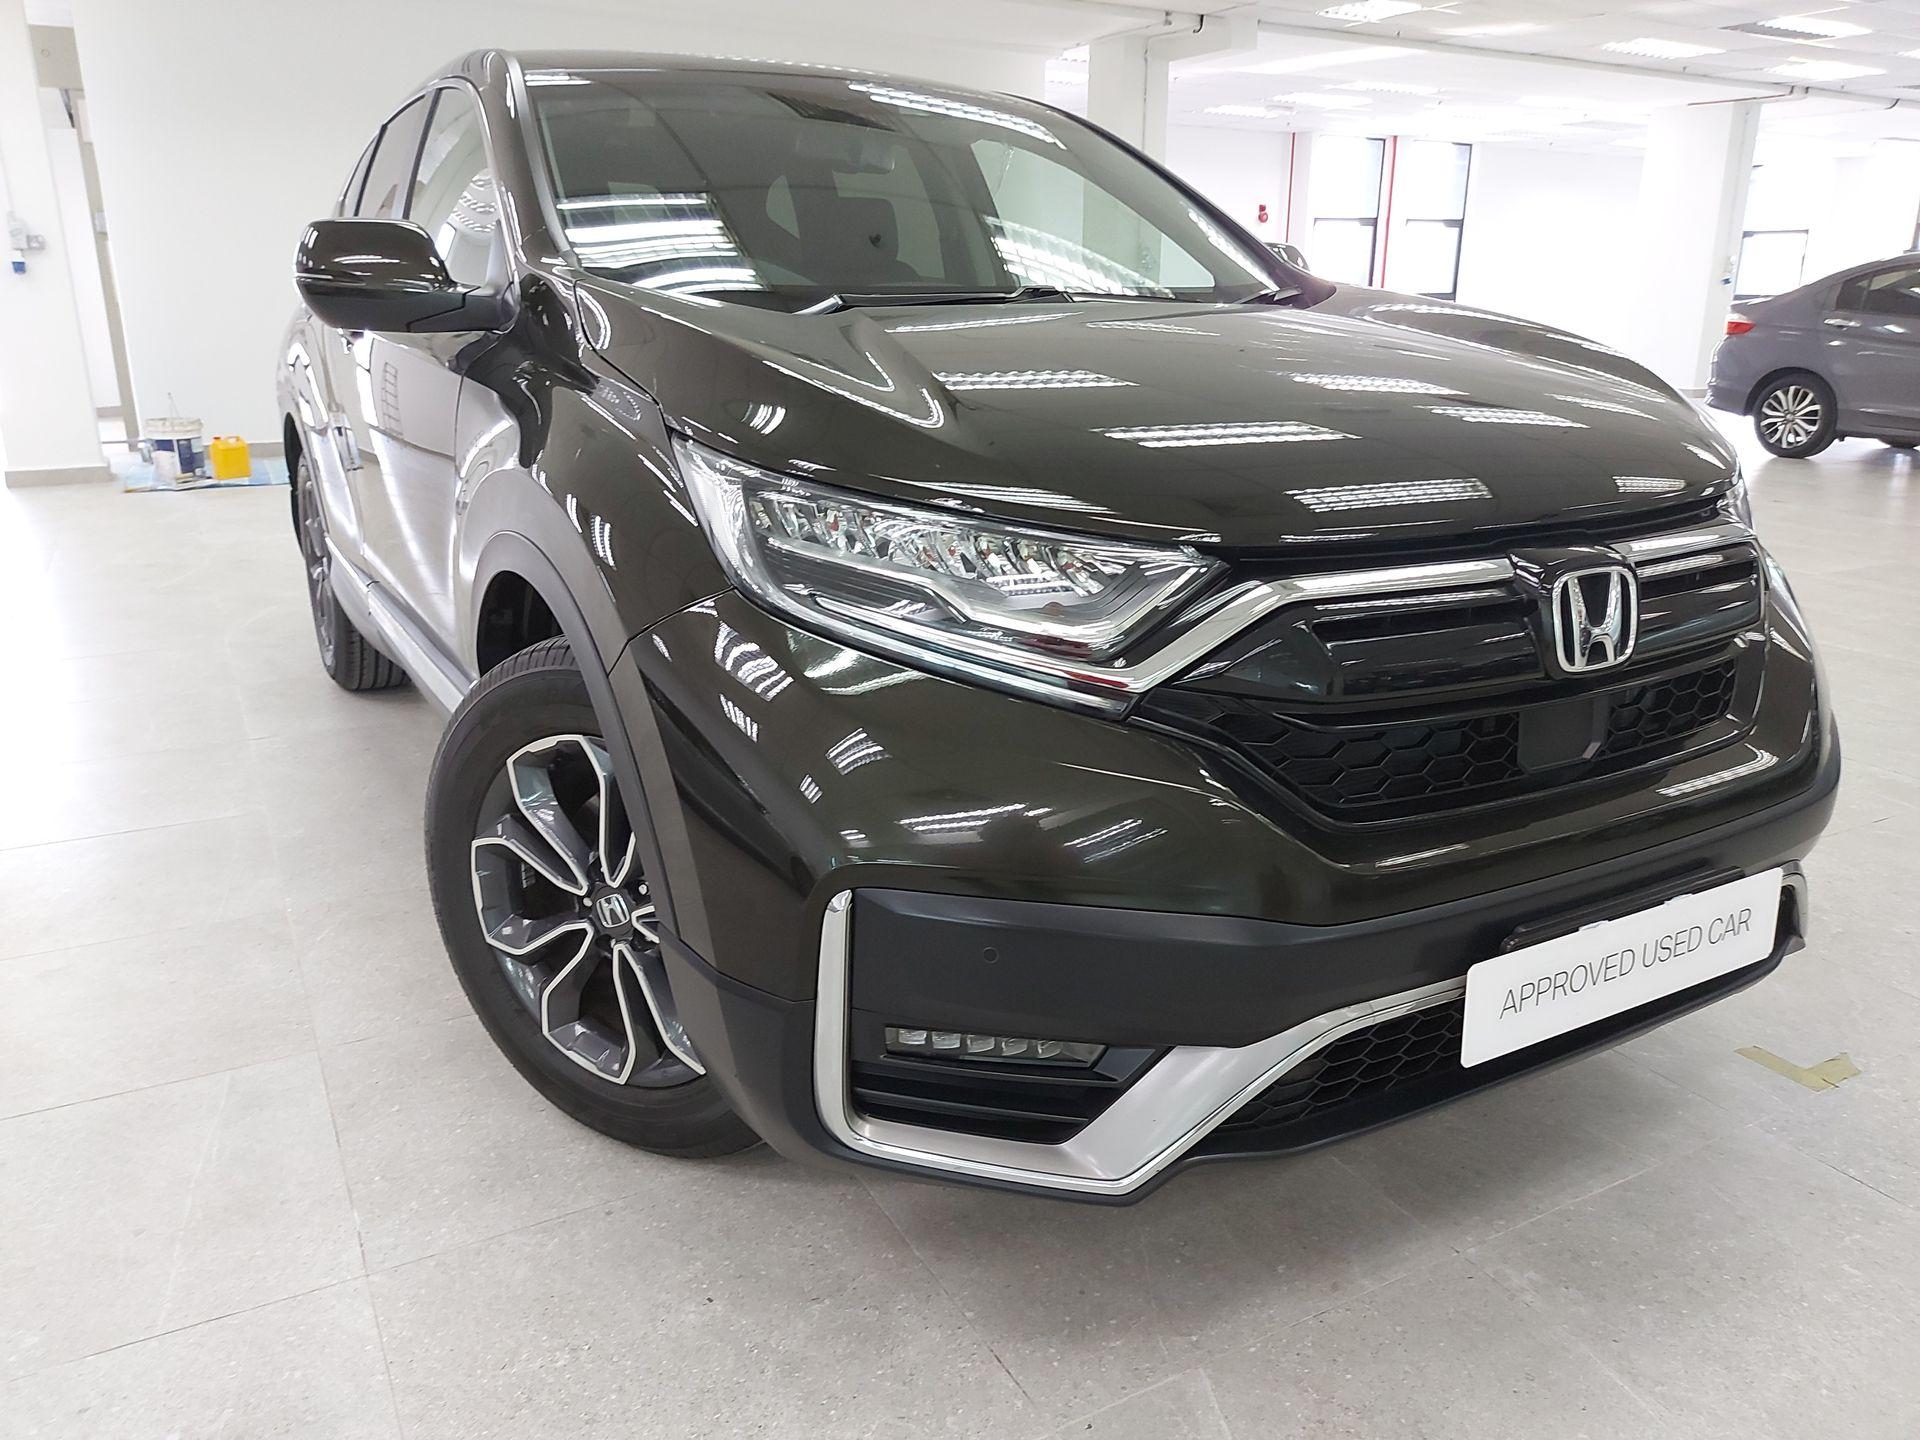 2021 Honda CR-V 1.5 TC-P